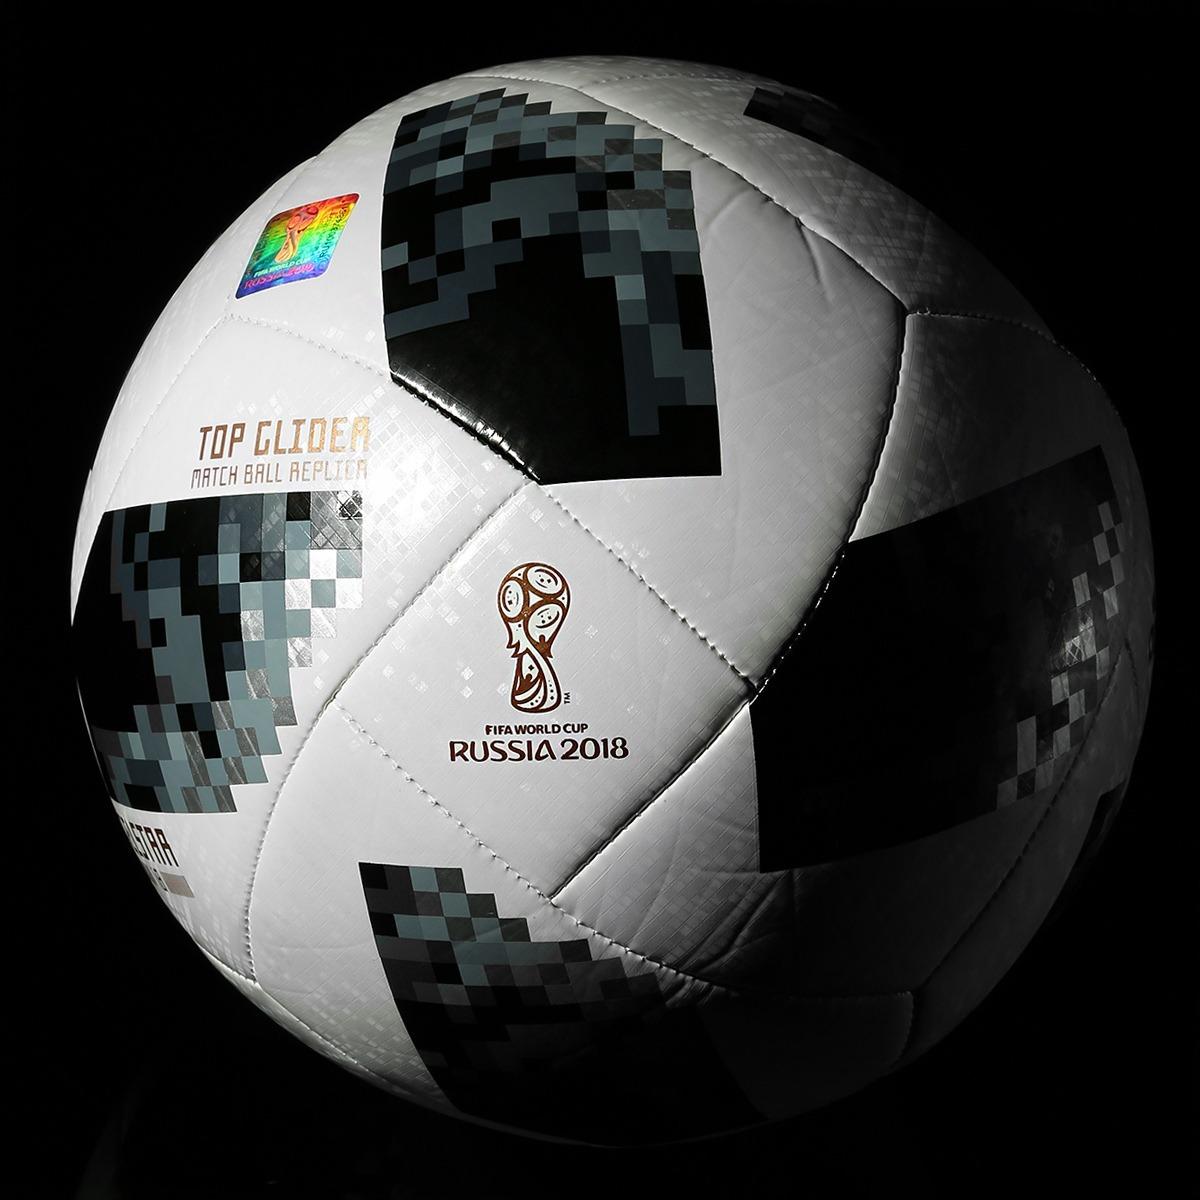 5275dd9274651 bola adidas futebol campo telstar 18 glider copa do mundo. Carregando zoom.